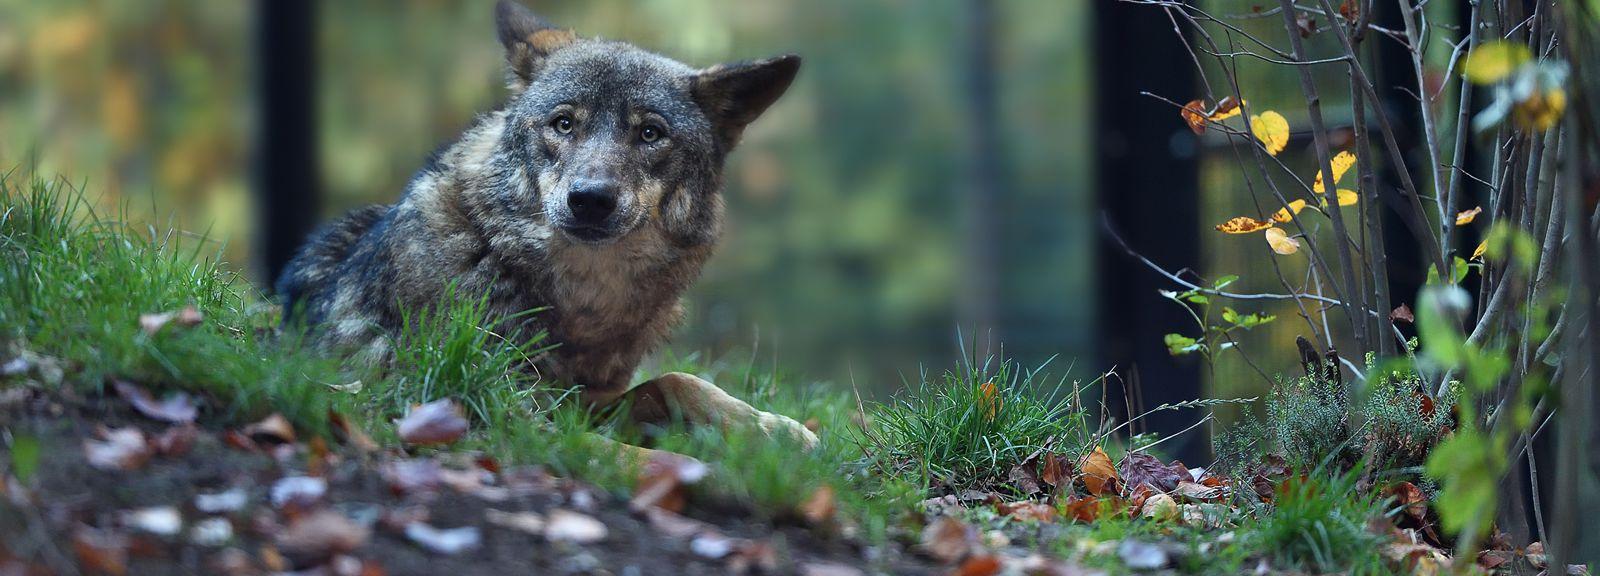 Loup ibérique © MNHN - F-G Grandin